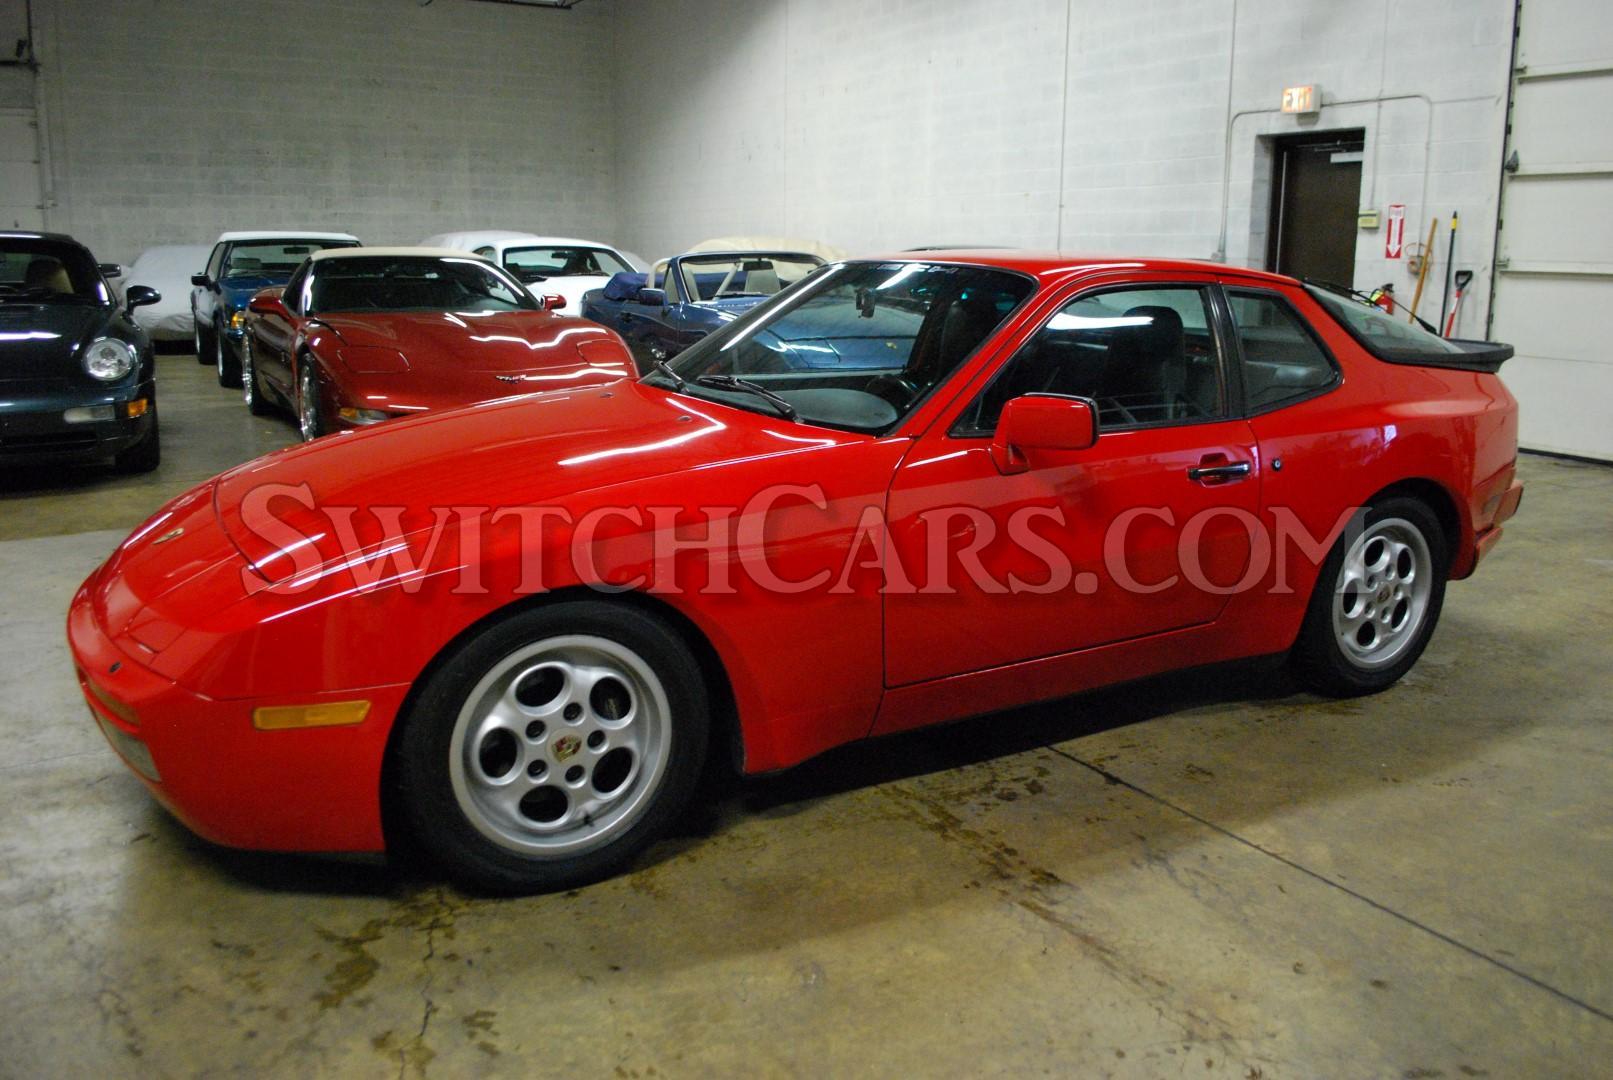 1987 porsche 944 turbo at switchcars inc sold. Black Bedroom Furniture Sets. Home Design Ideas